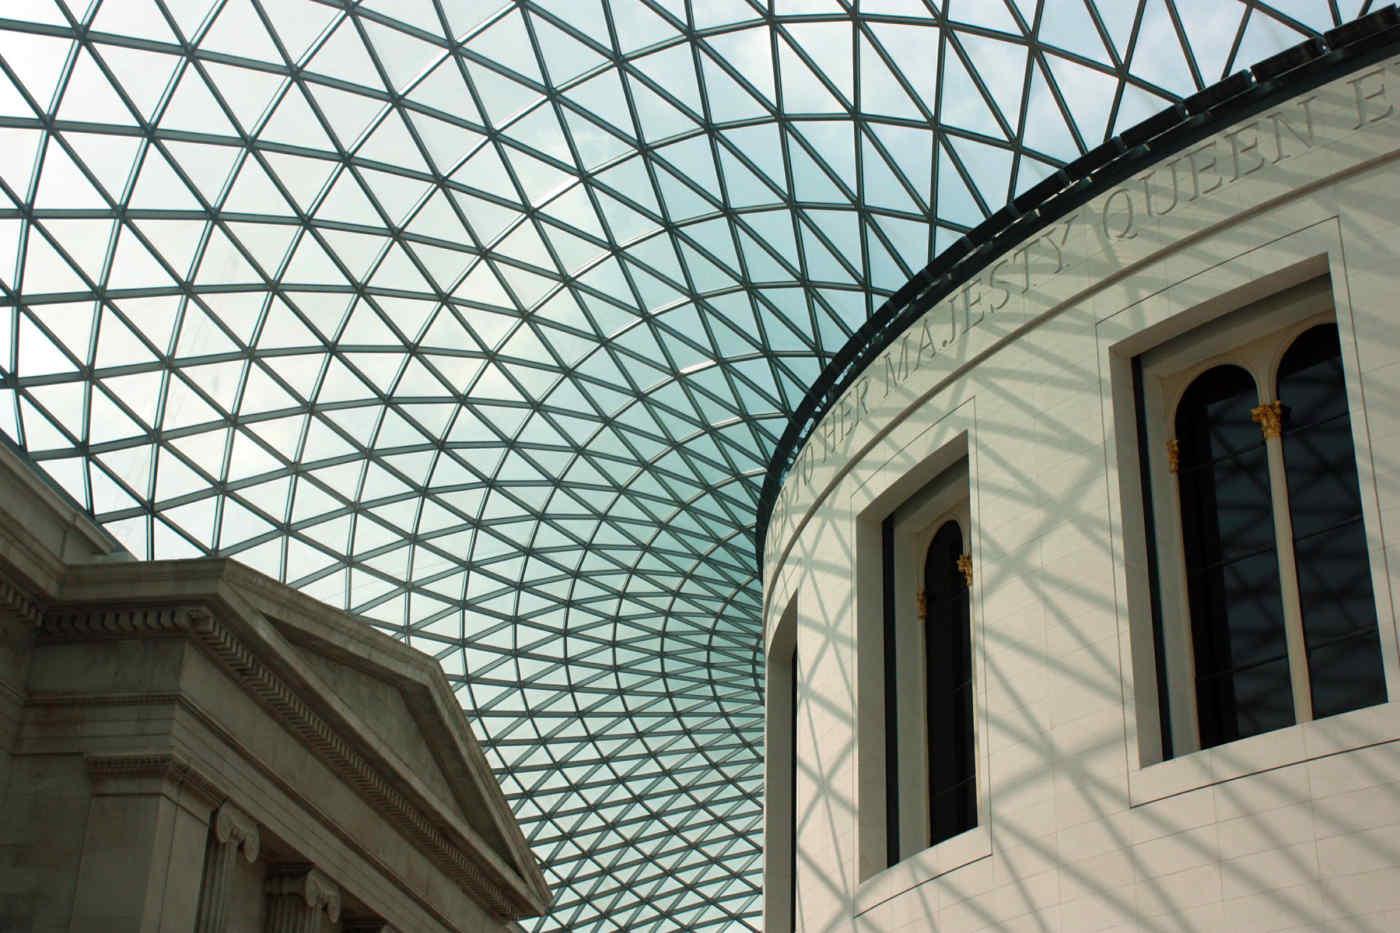 British Museum • London, England